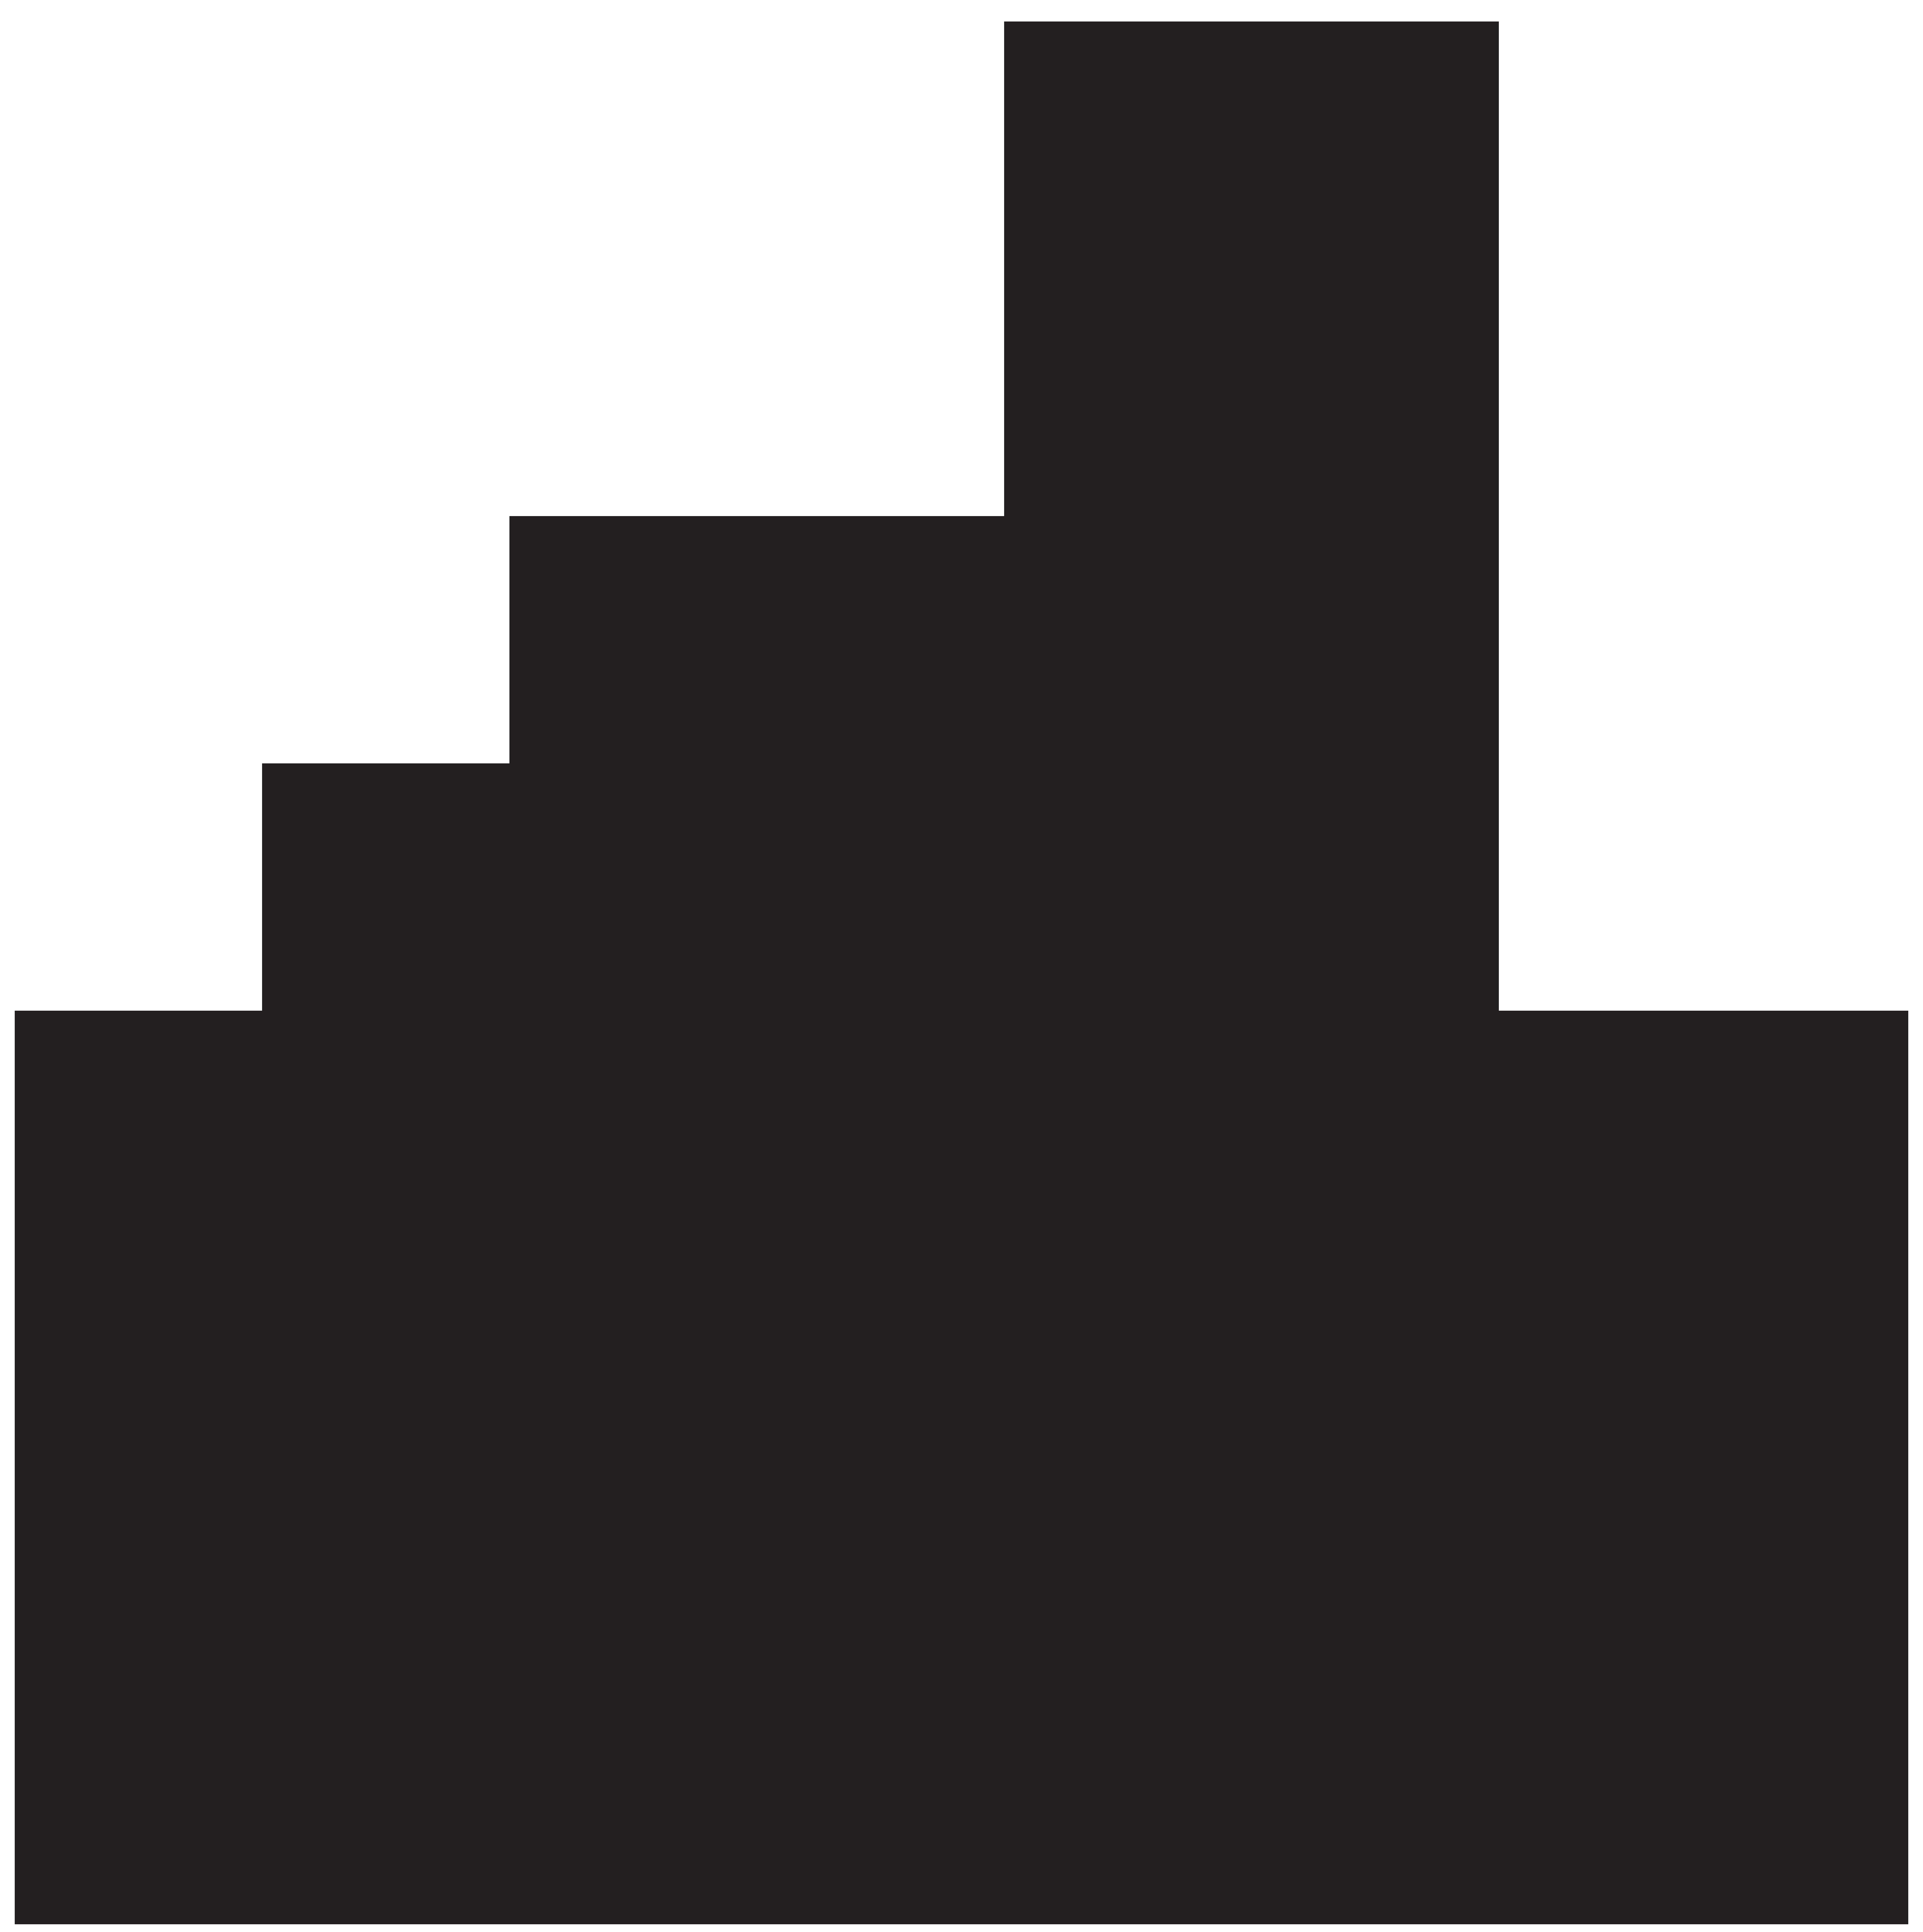 Female Cyclist Silhouette Clip Art Image.